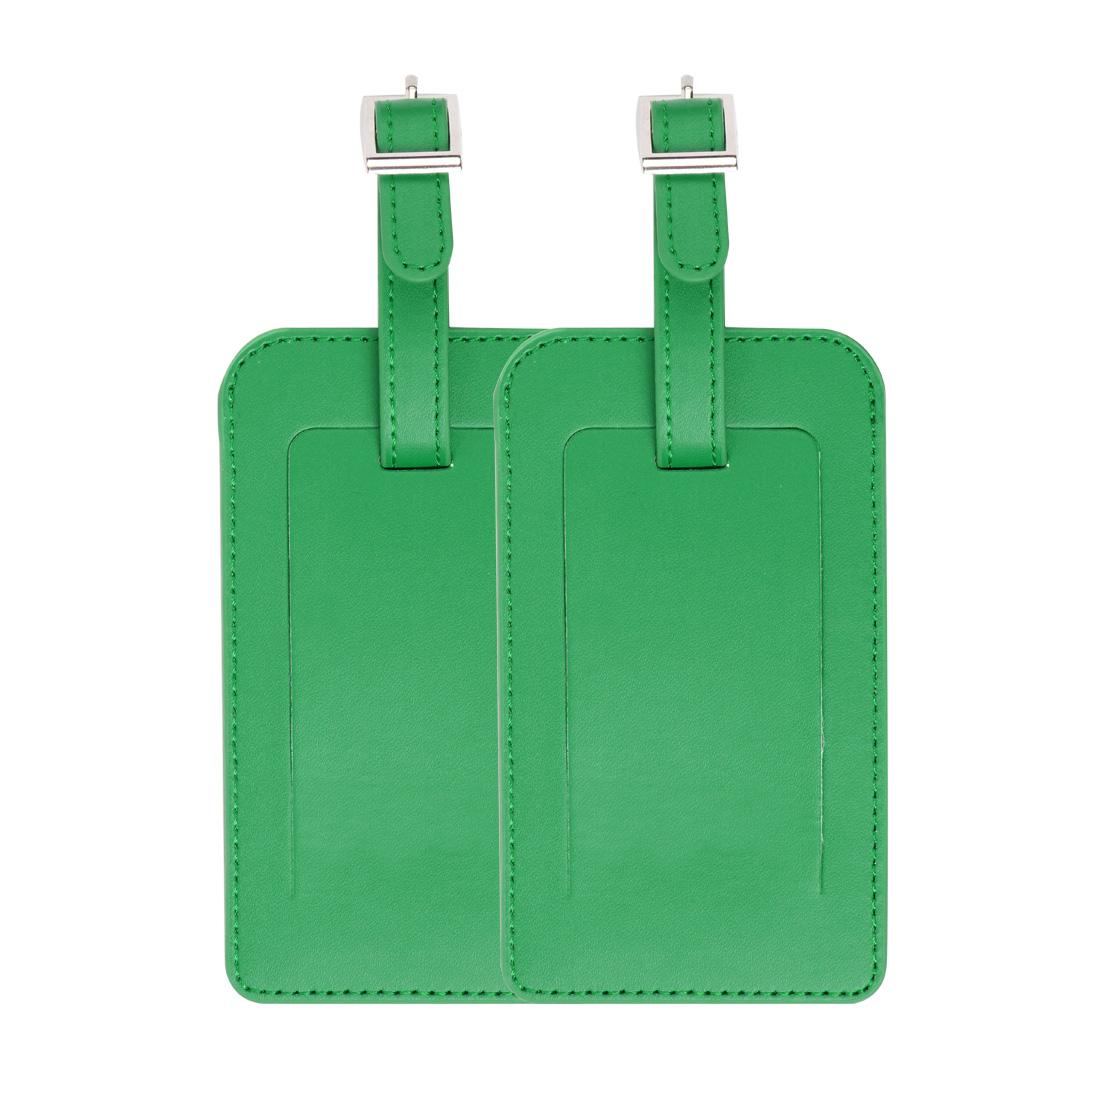 2pcs Travel Luggage Tag PU Leather Baggage Bag Name Address ID Label Green